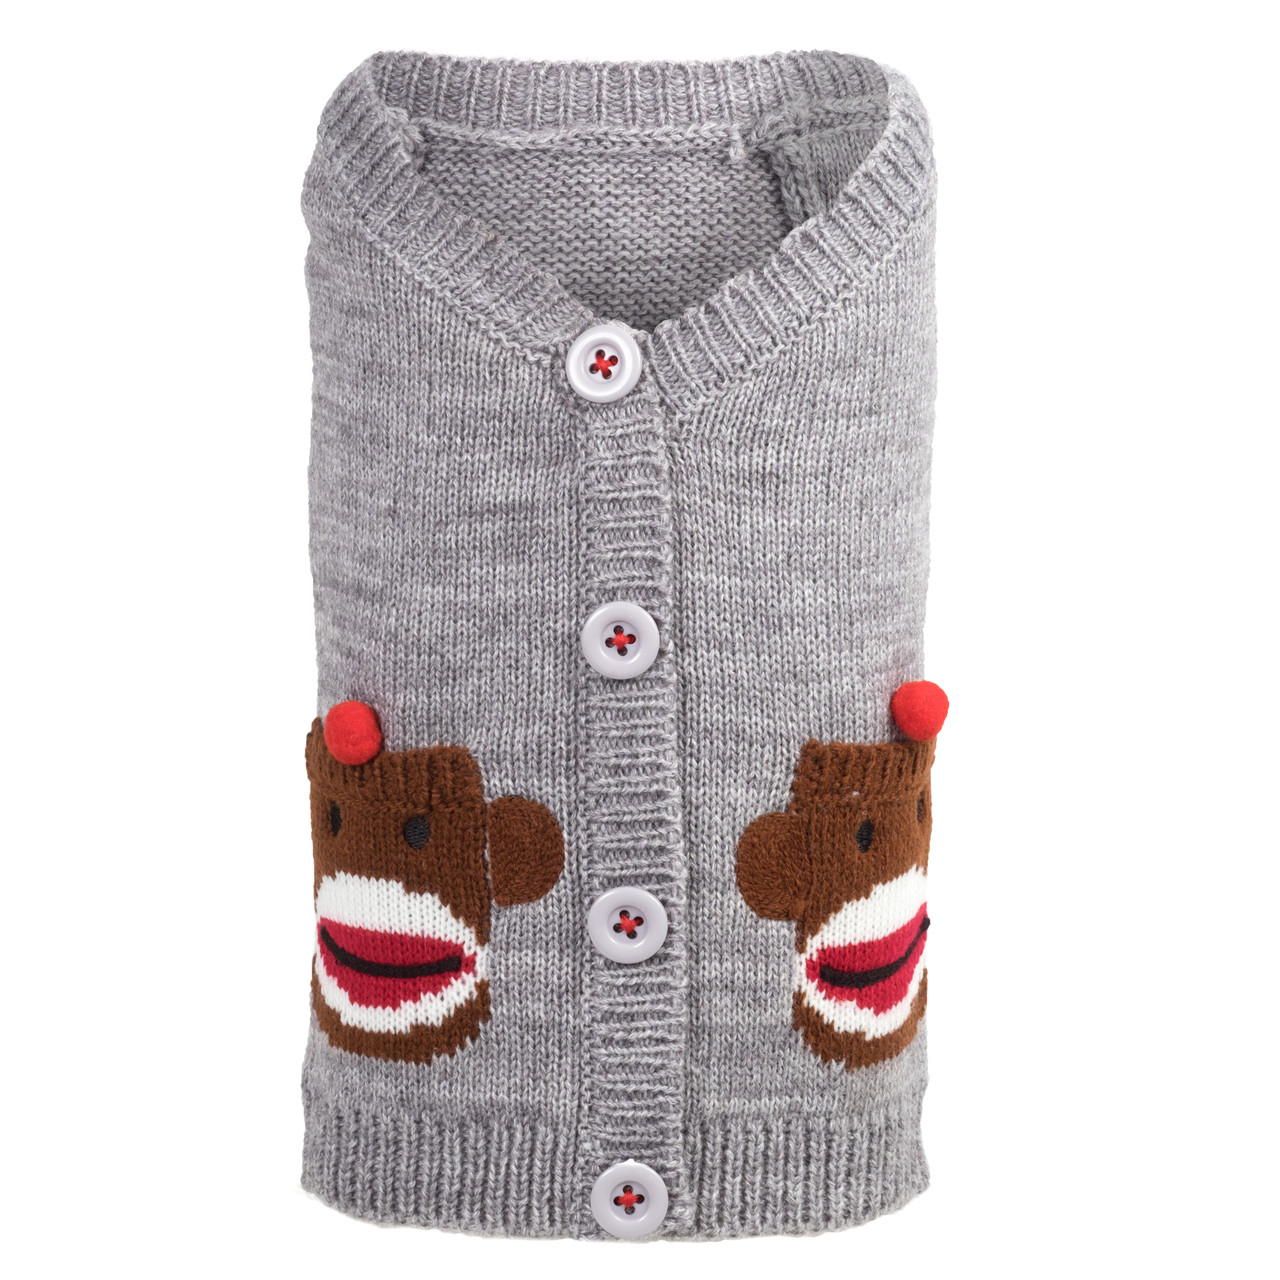 Sock Monkey Cardigan Dog Sweater Puppy Kisses